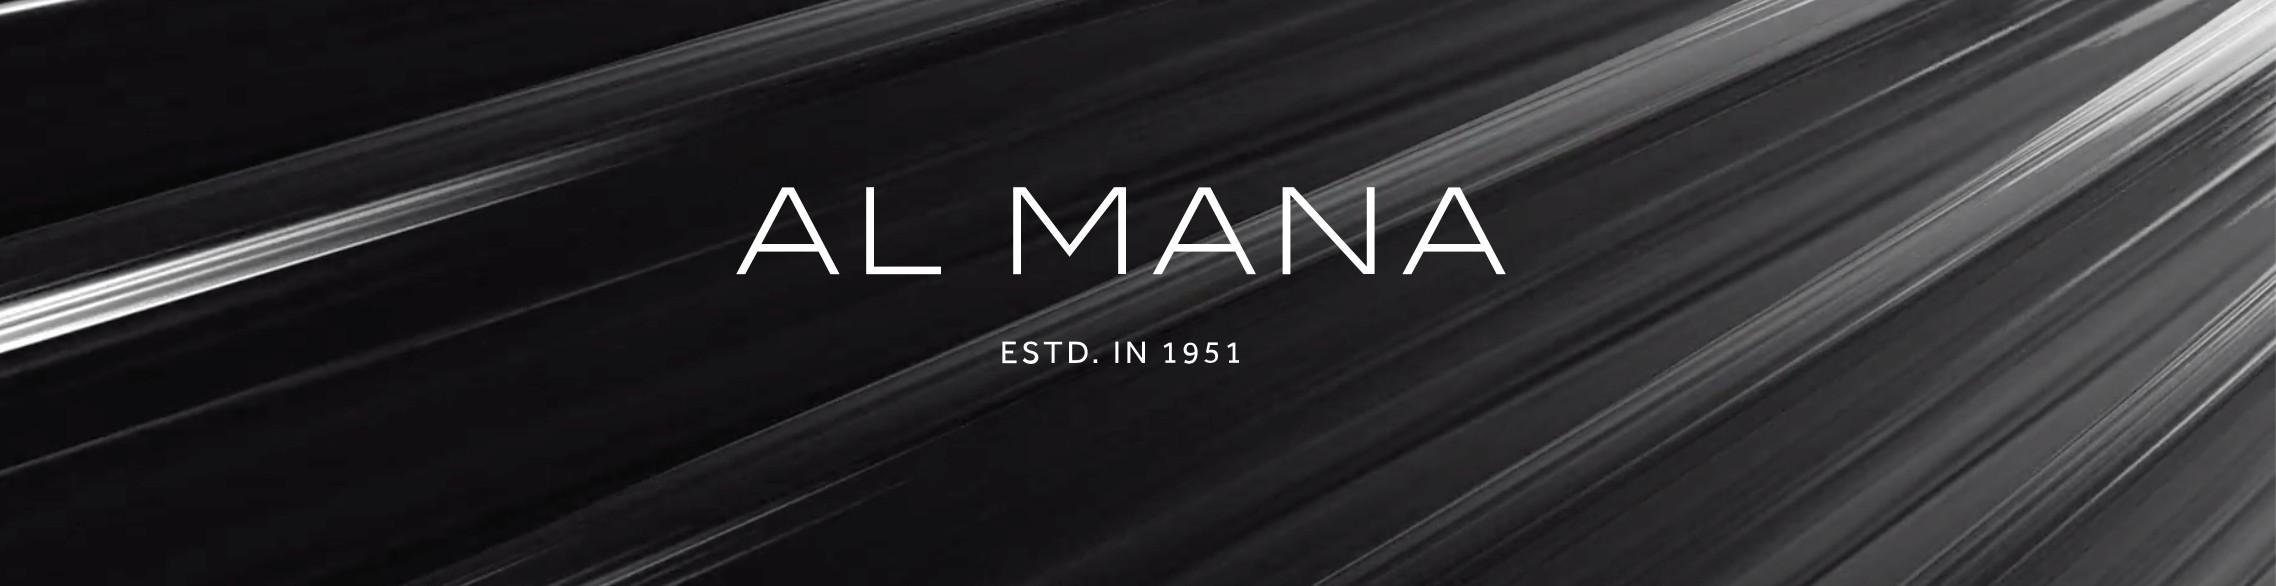 Al Mana | LinkedIn